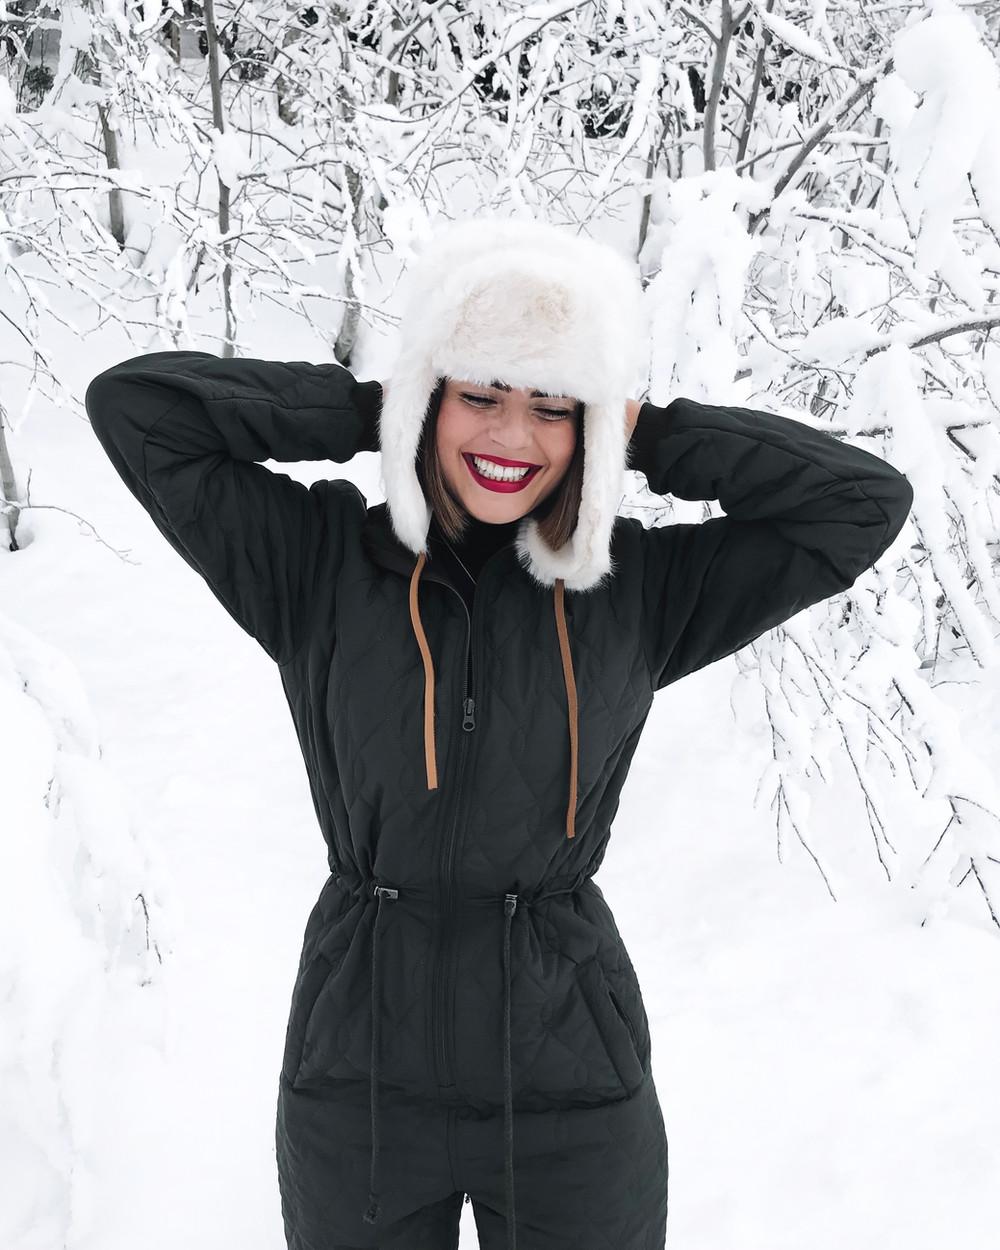 Winter Wonderland- The Alps Ski Guide